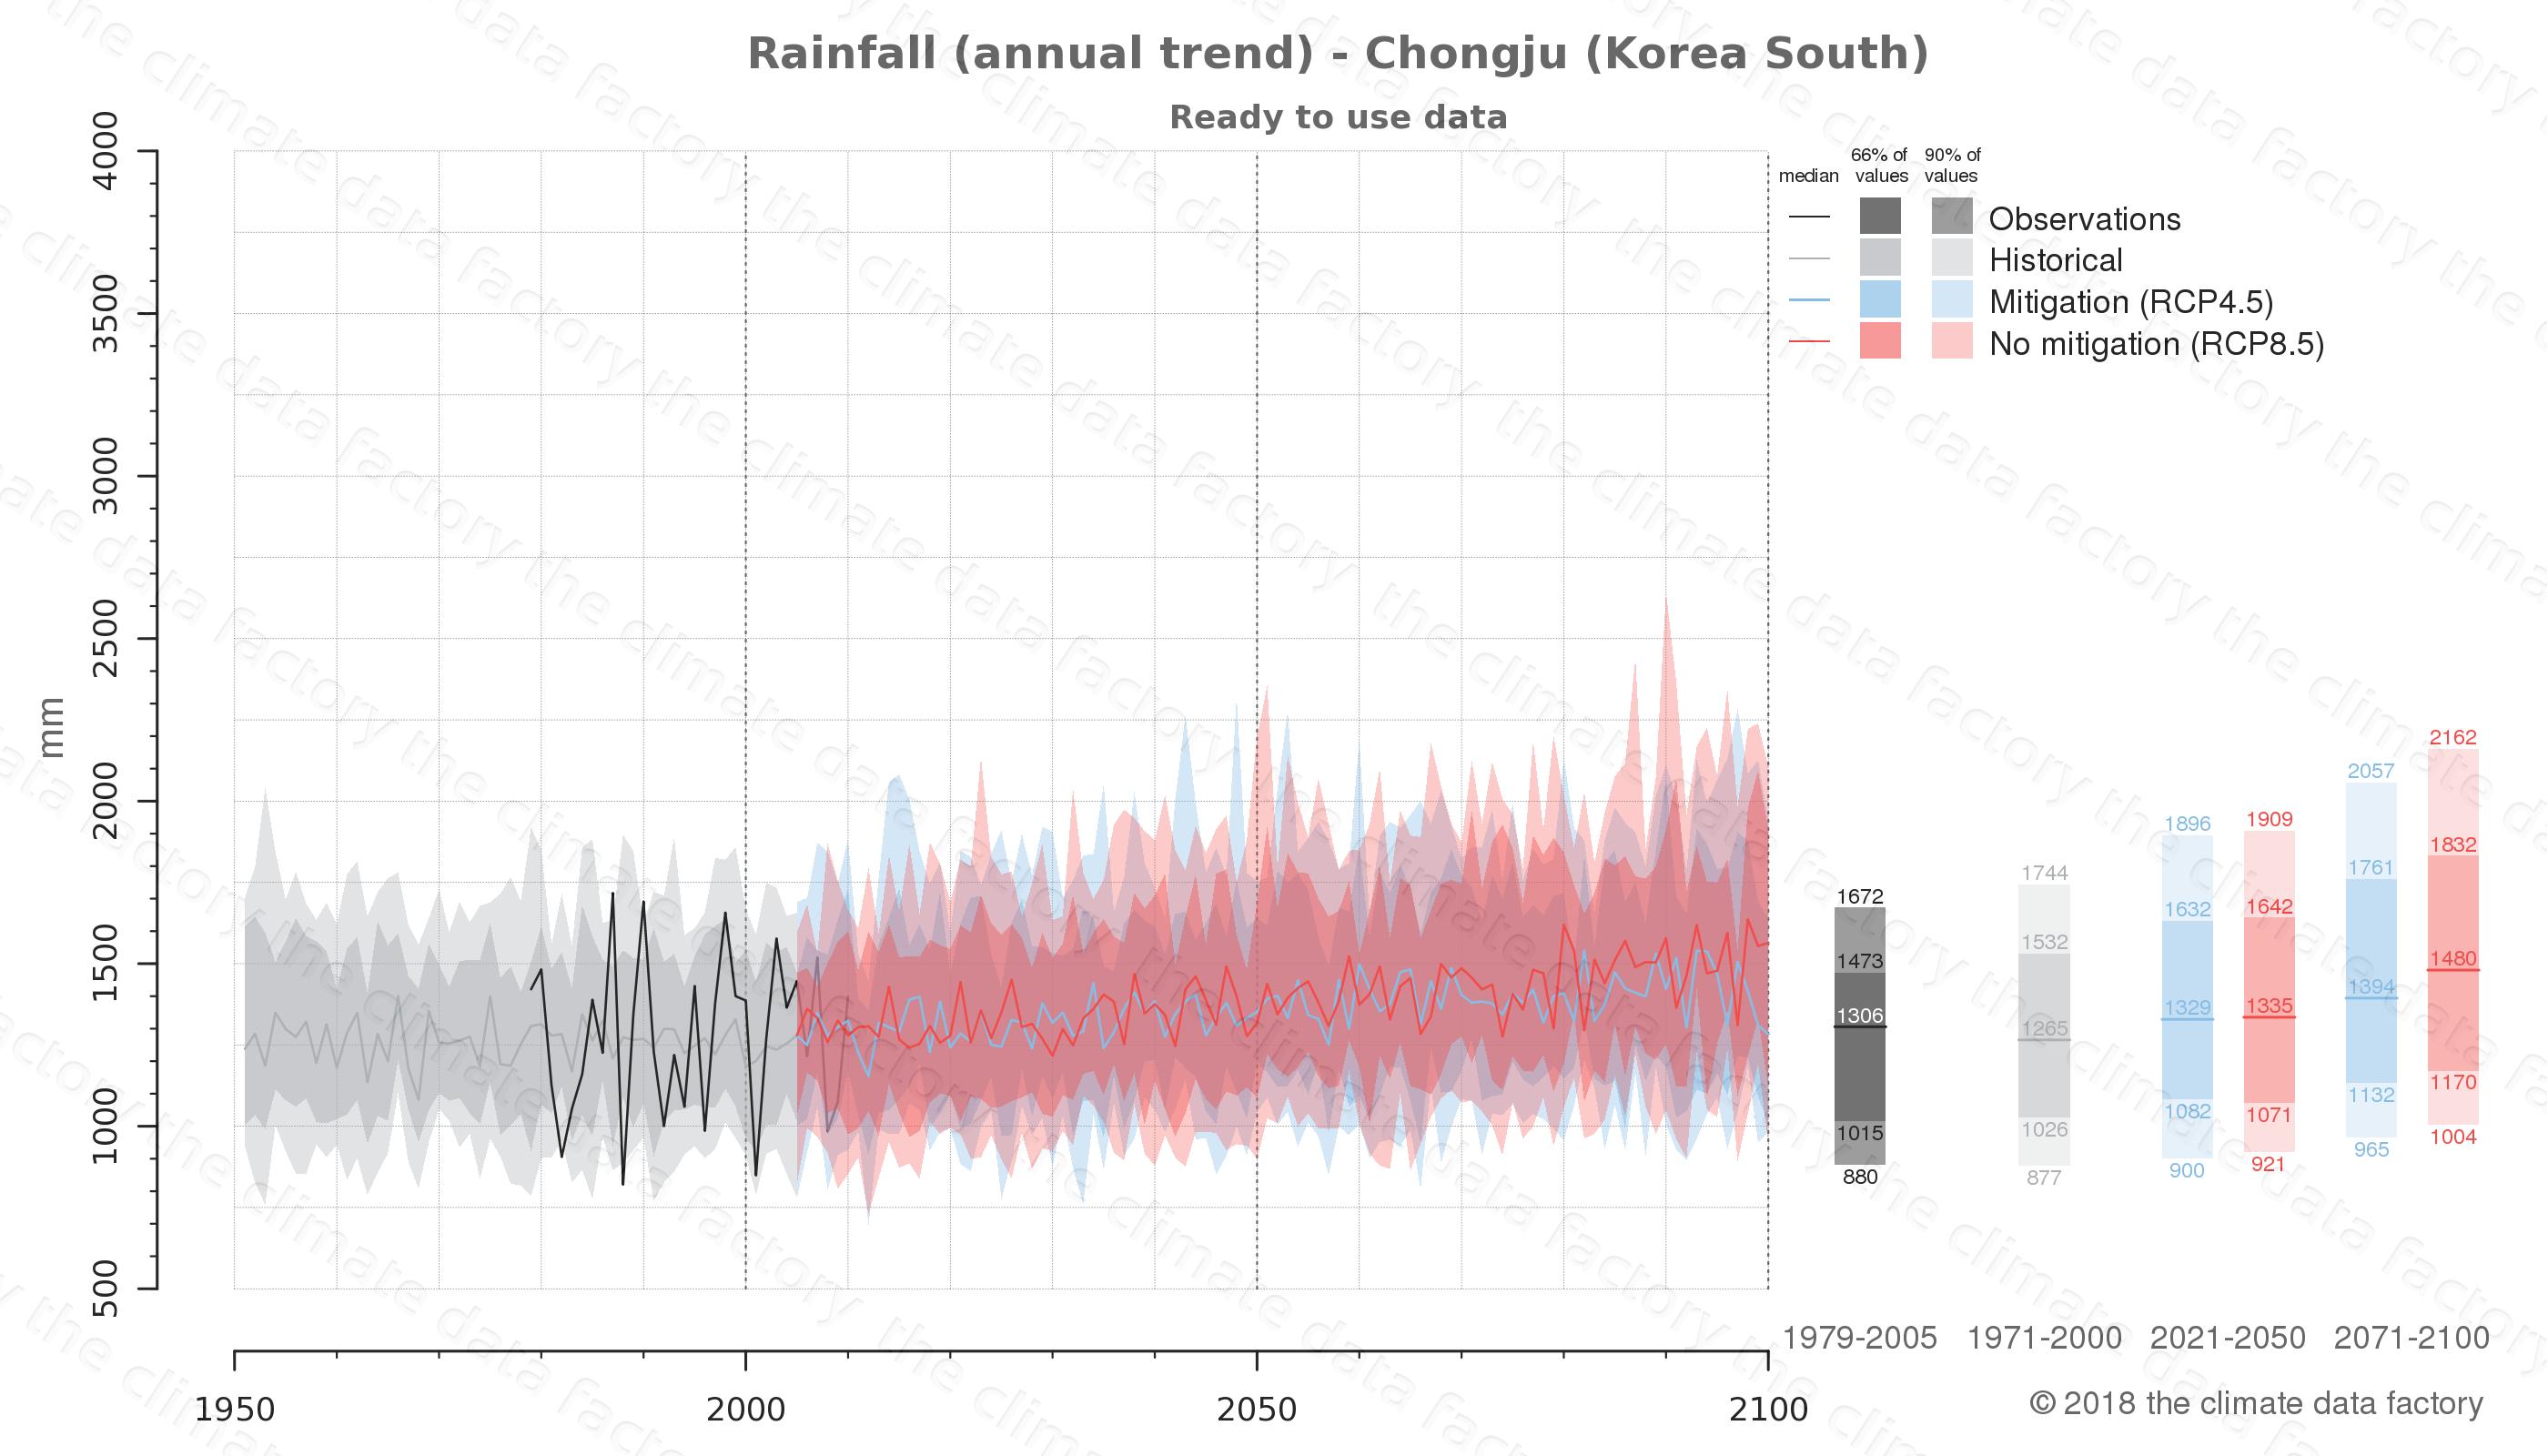 climate change data policy adaptation climate graph city data rainfall chongju south korea